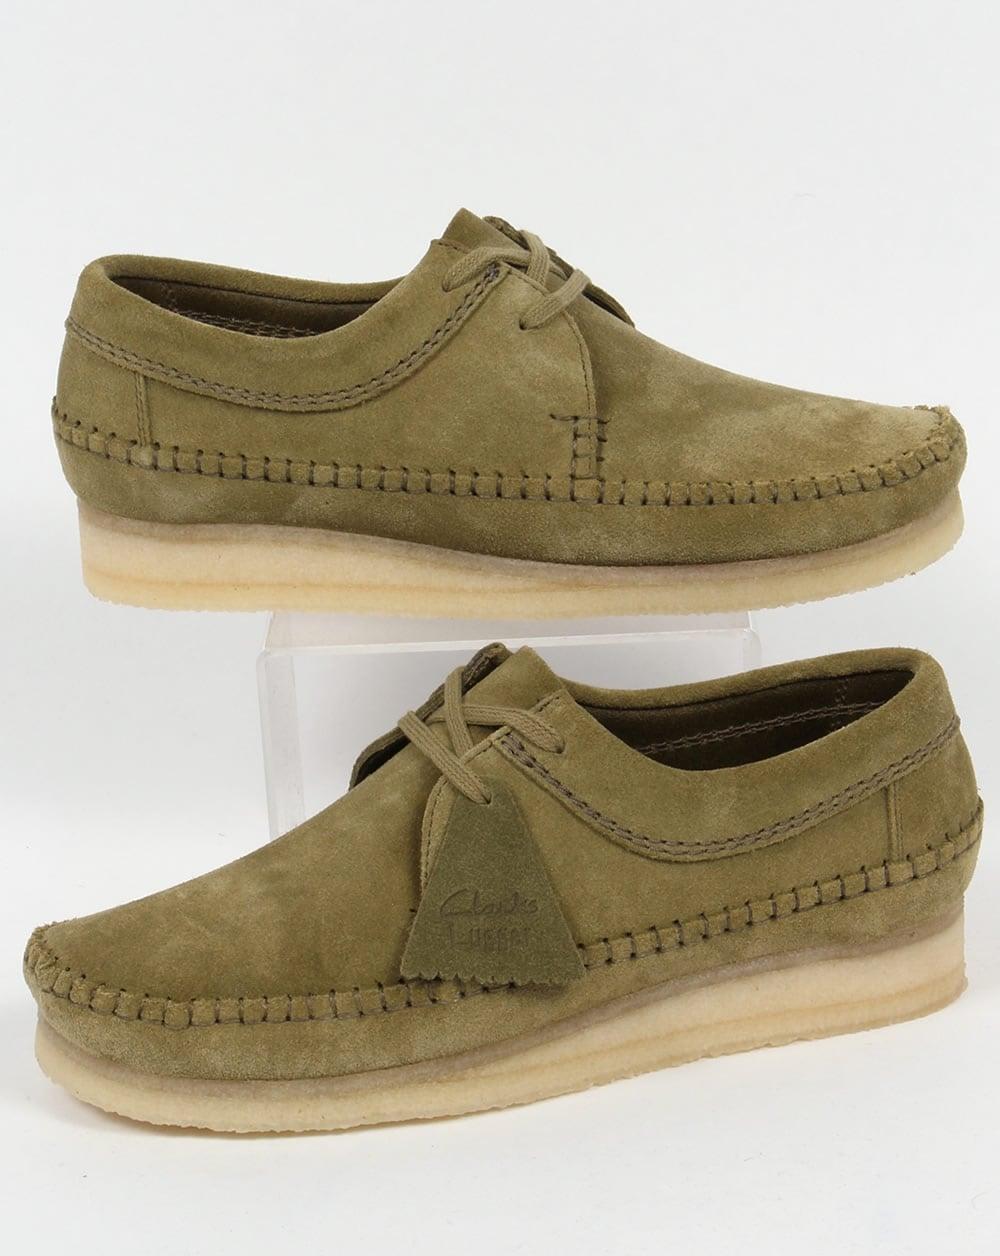 56cfcdc24ef03 Clarks Originals Clarks Originals Weaver Suede Shoes Forest Green